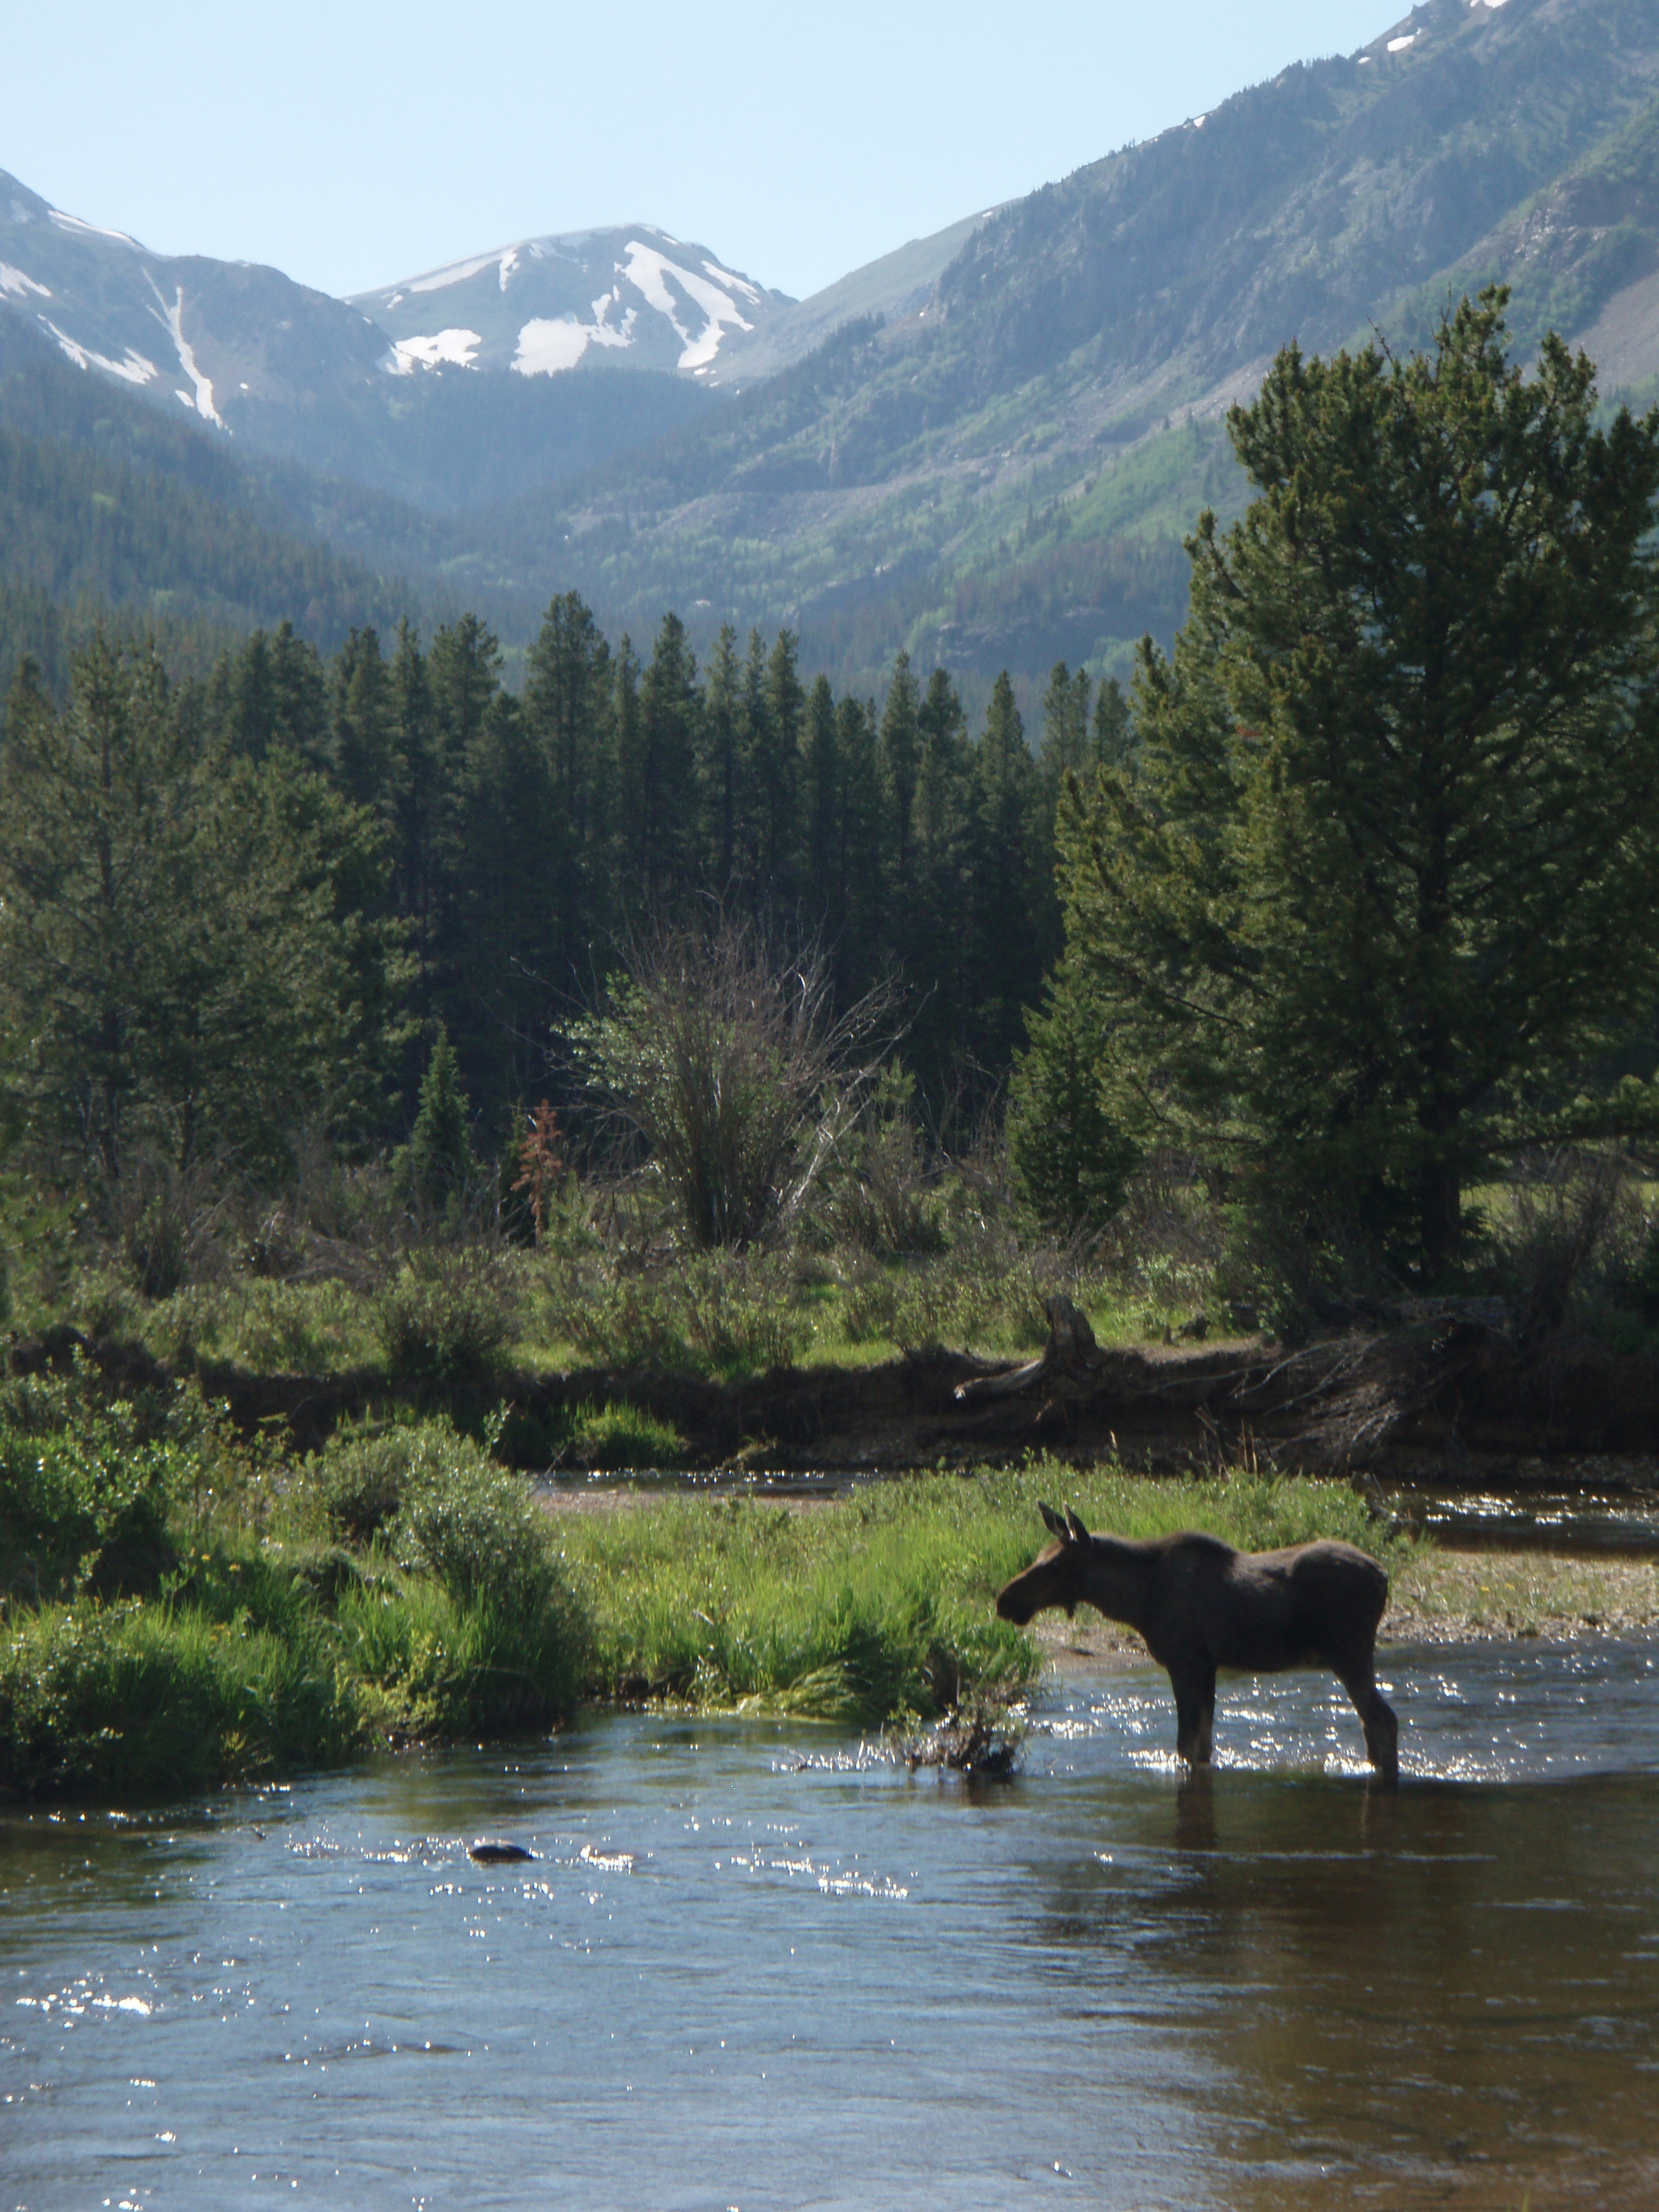 Elk Hunting in Colorado's GMU 18 - Grand County - HuntScore